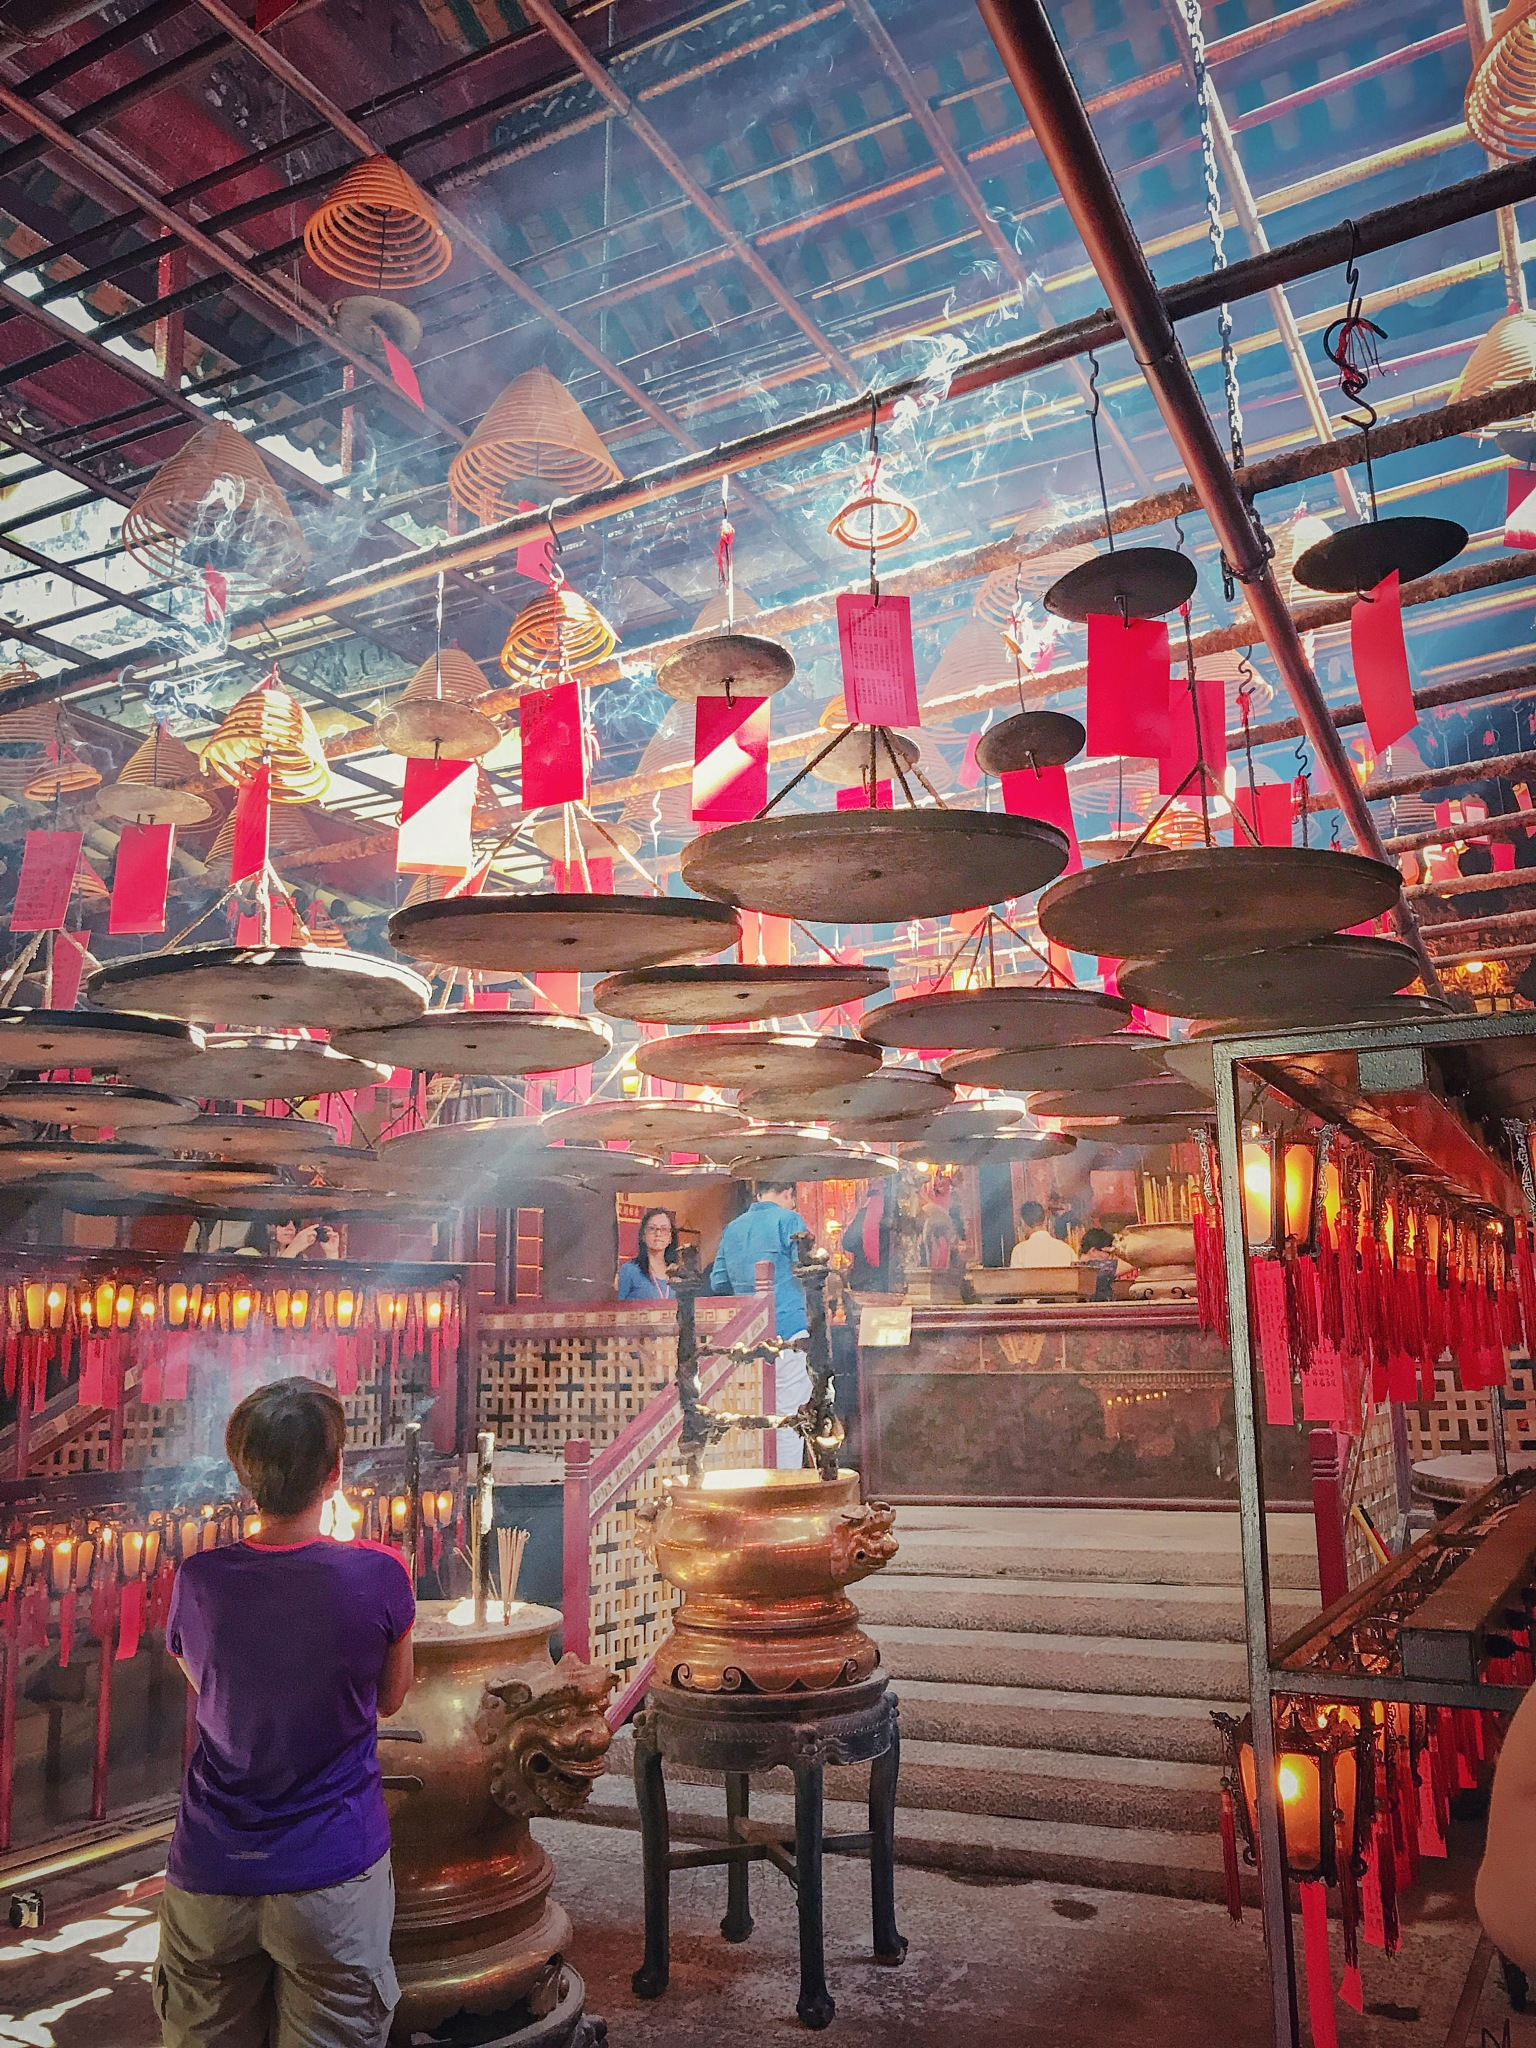 Man Mo Temple by Anson Yu